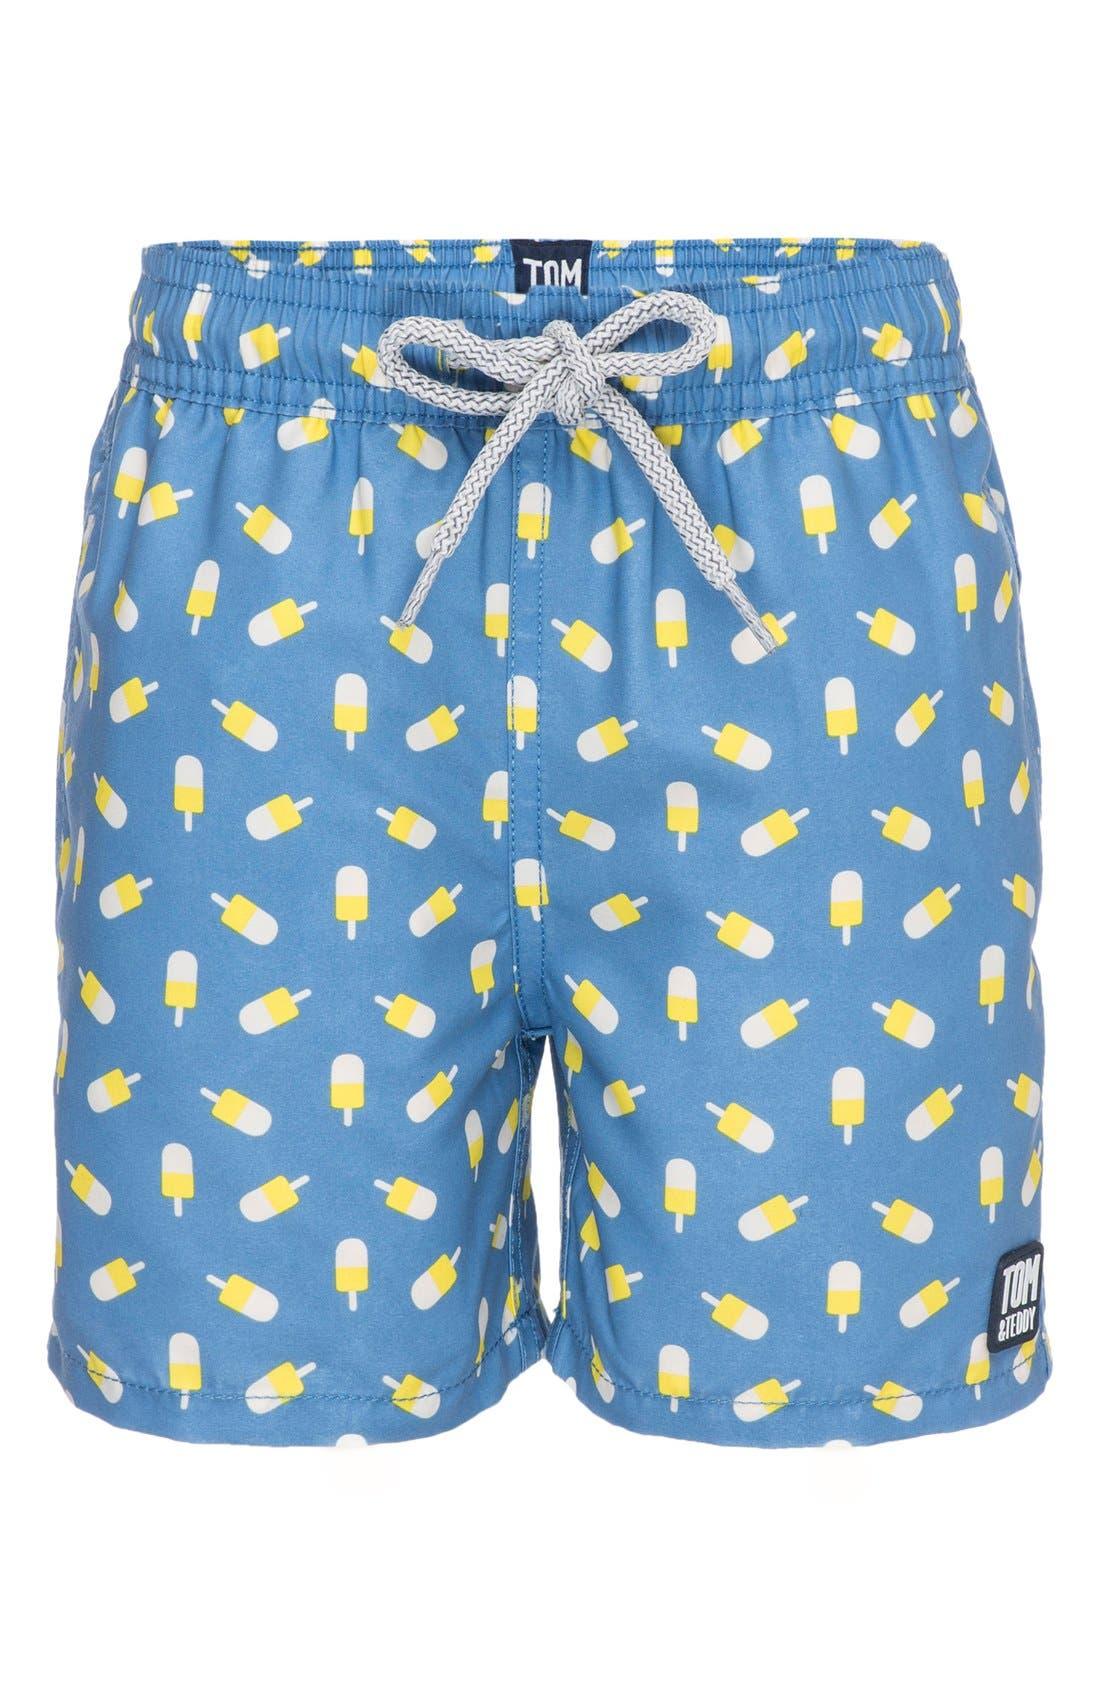 Tom & Teddy Ice Lollies Swim Trunks (Toddler Boys, Little Boys & Big Boys)